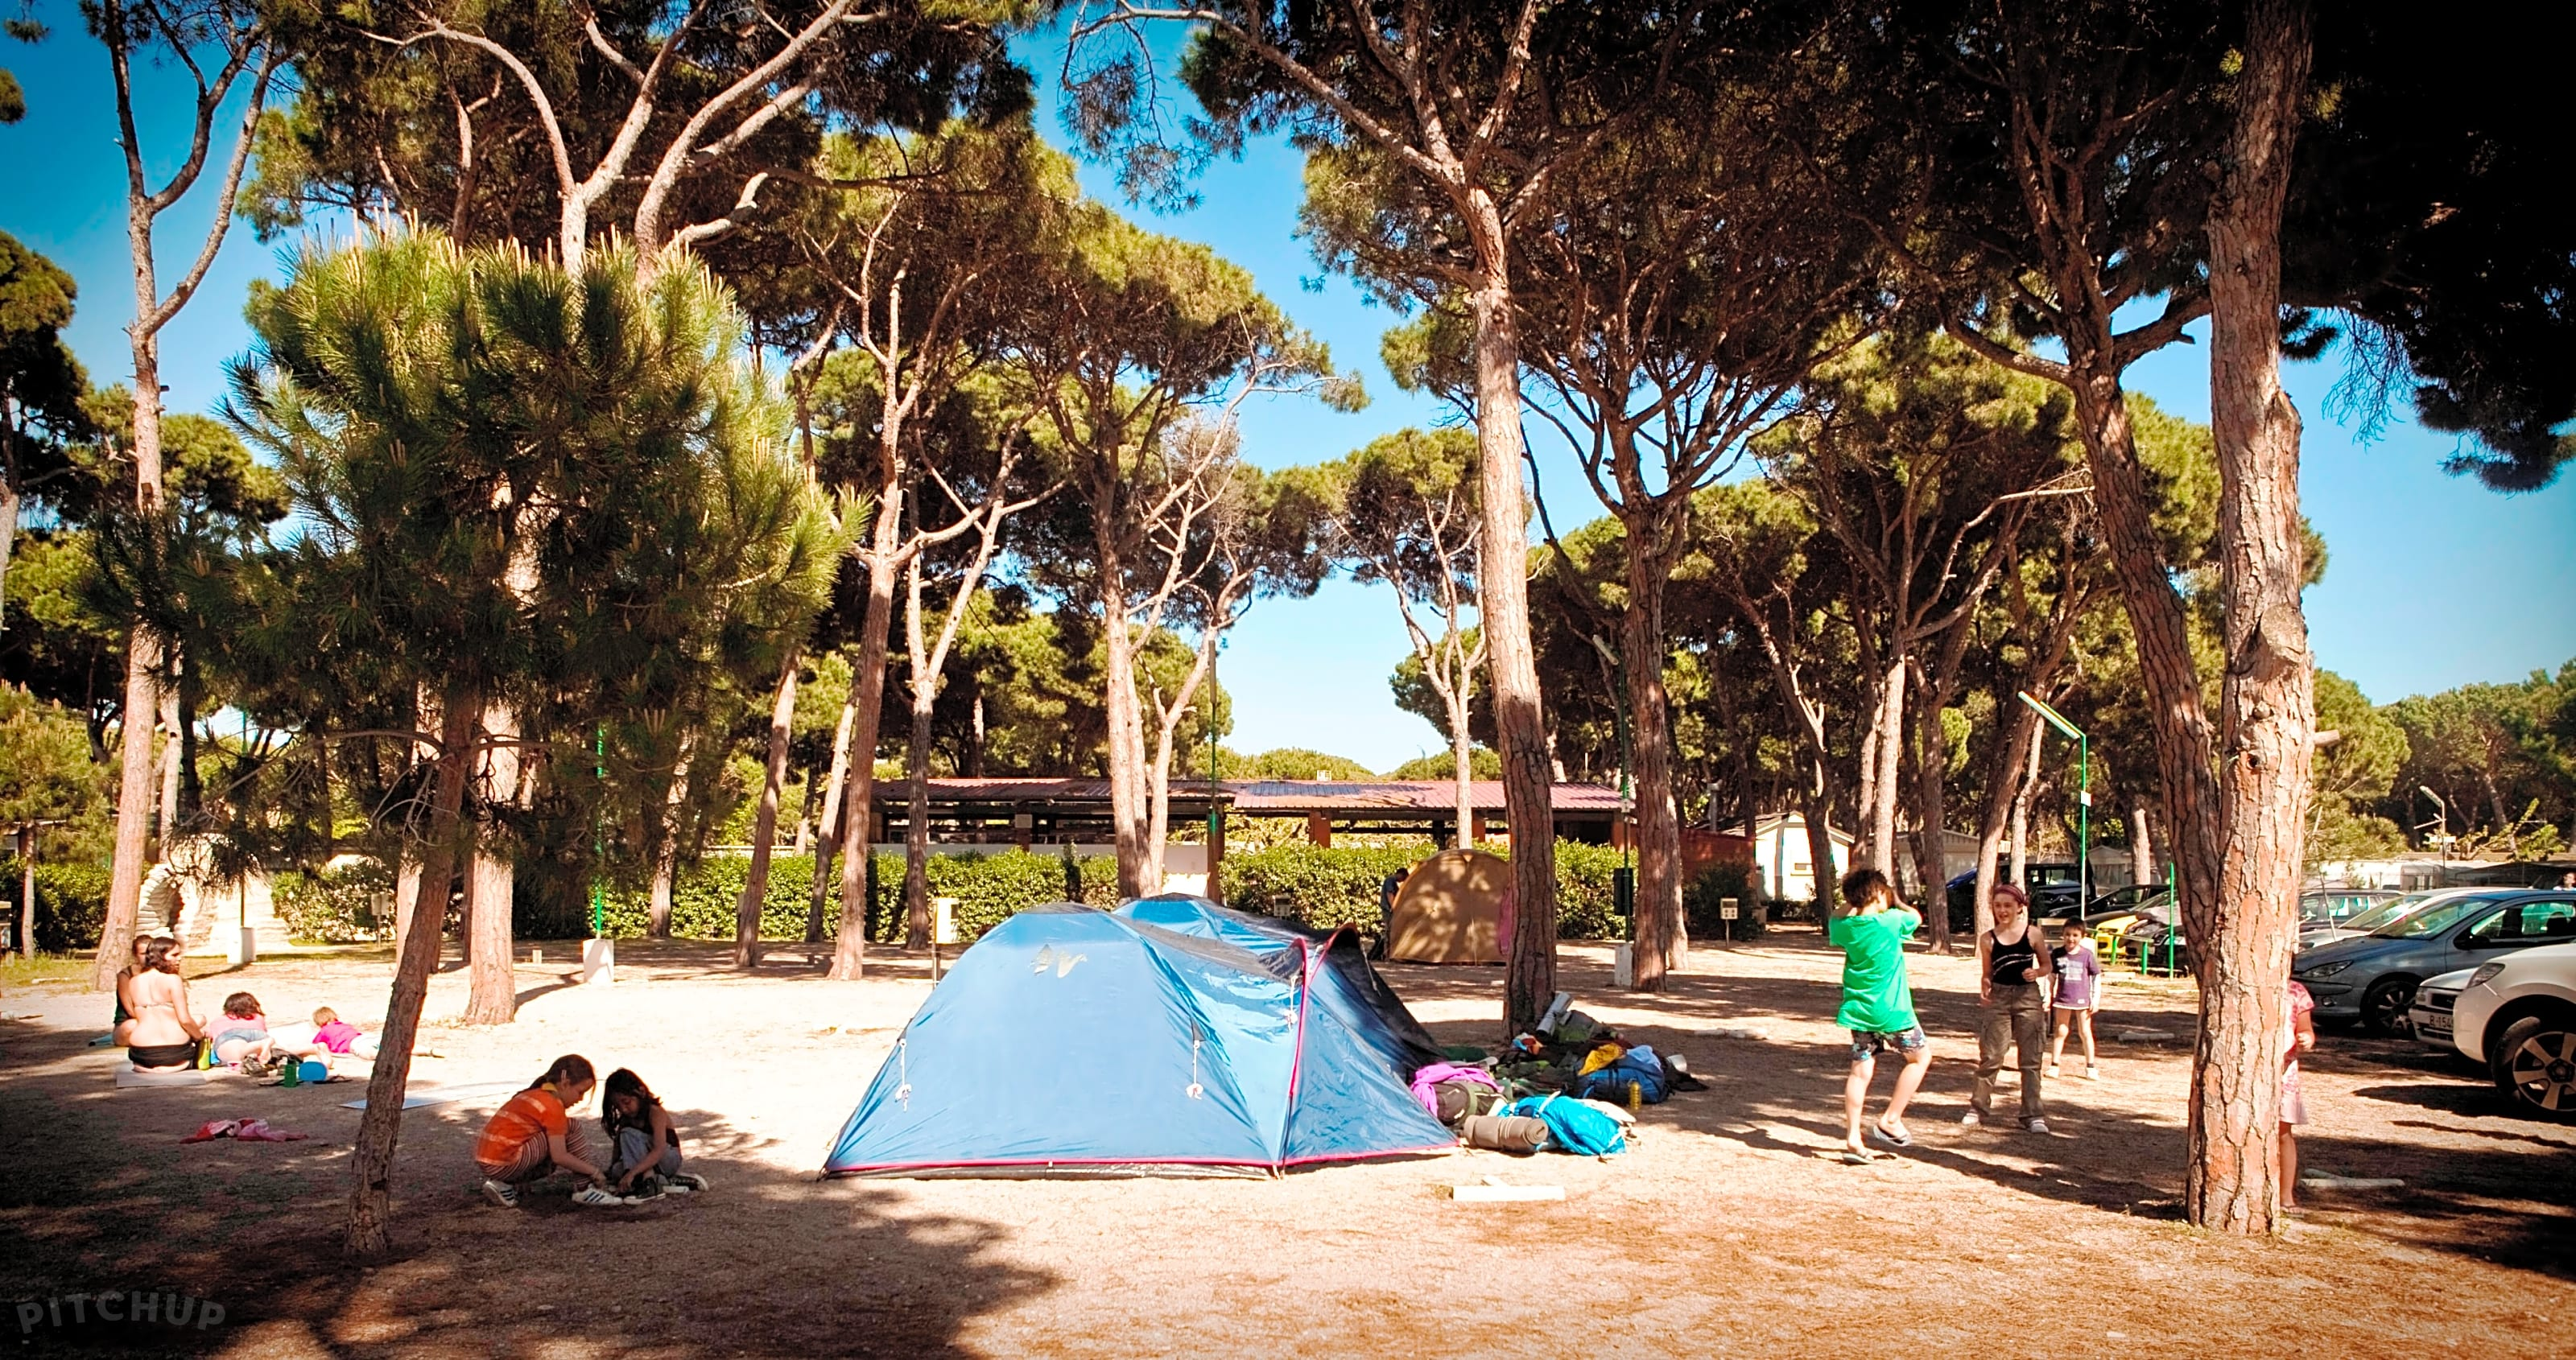 Camping Estrella De Mar Castelldefels Precios Actualizados De 2021 Pitchup